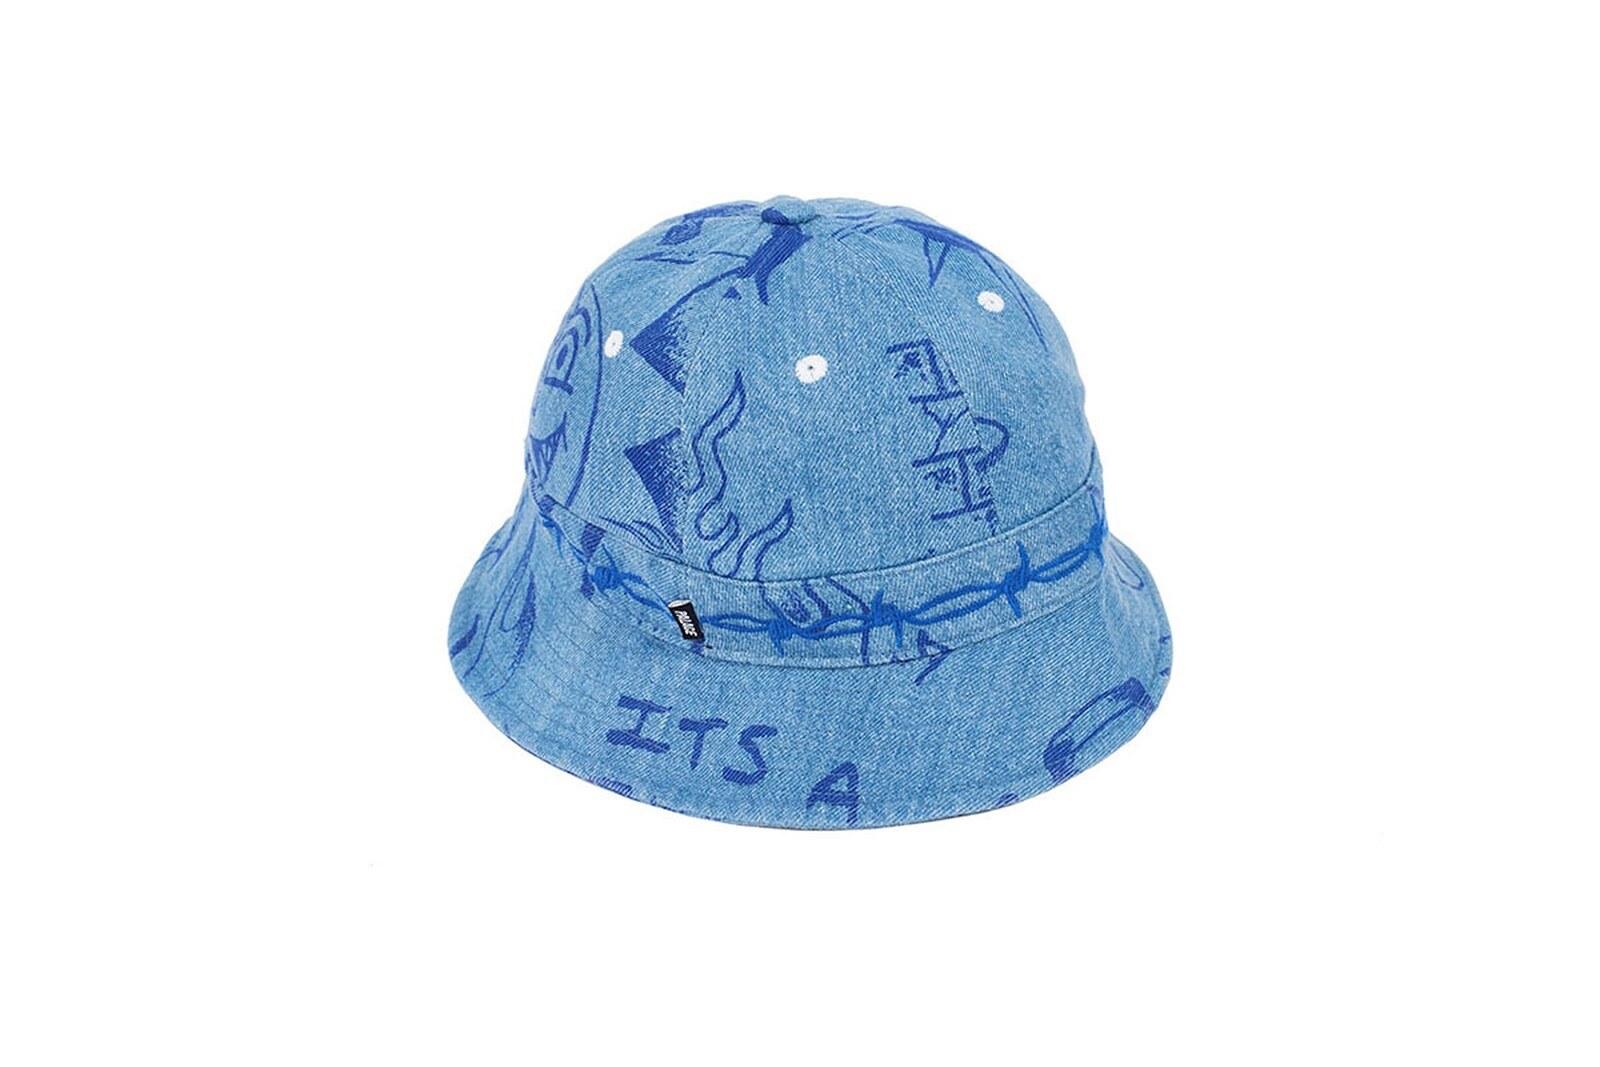 Palace x Lotties hat